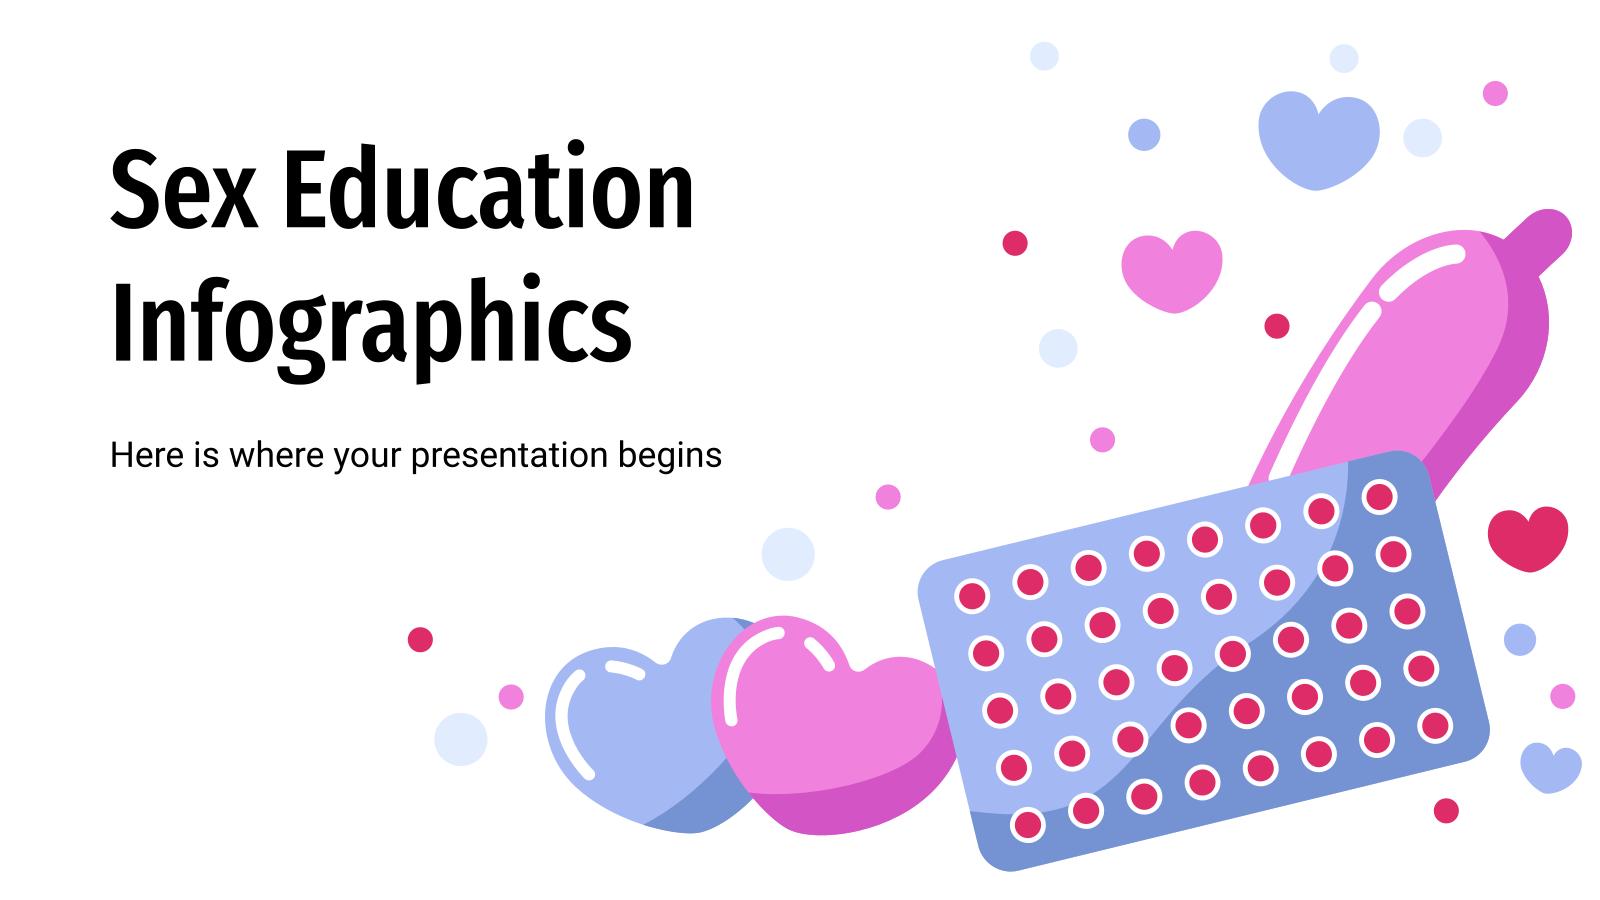 Plantilla de presentación Infografías de educación sexual